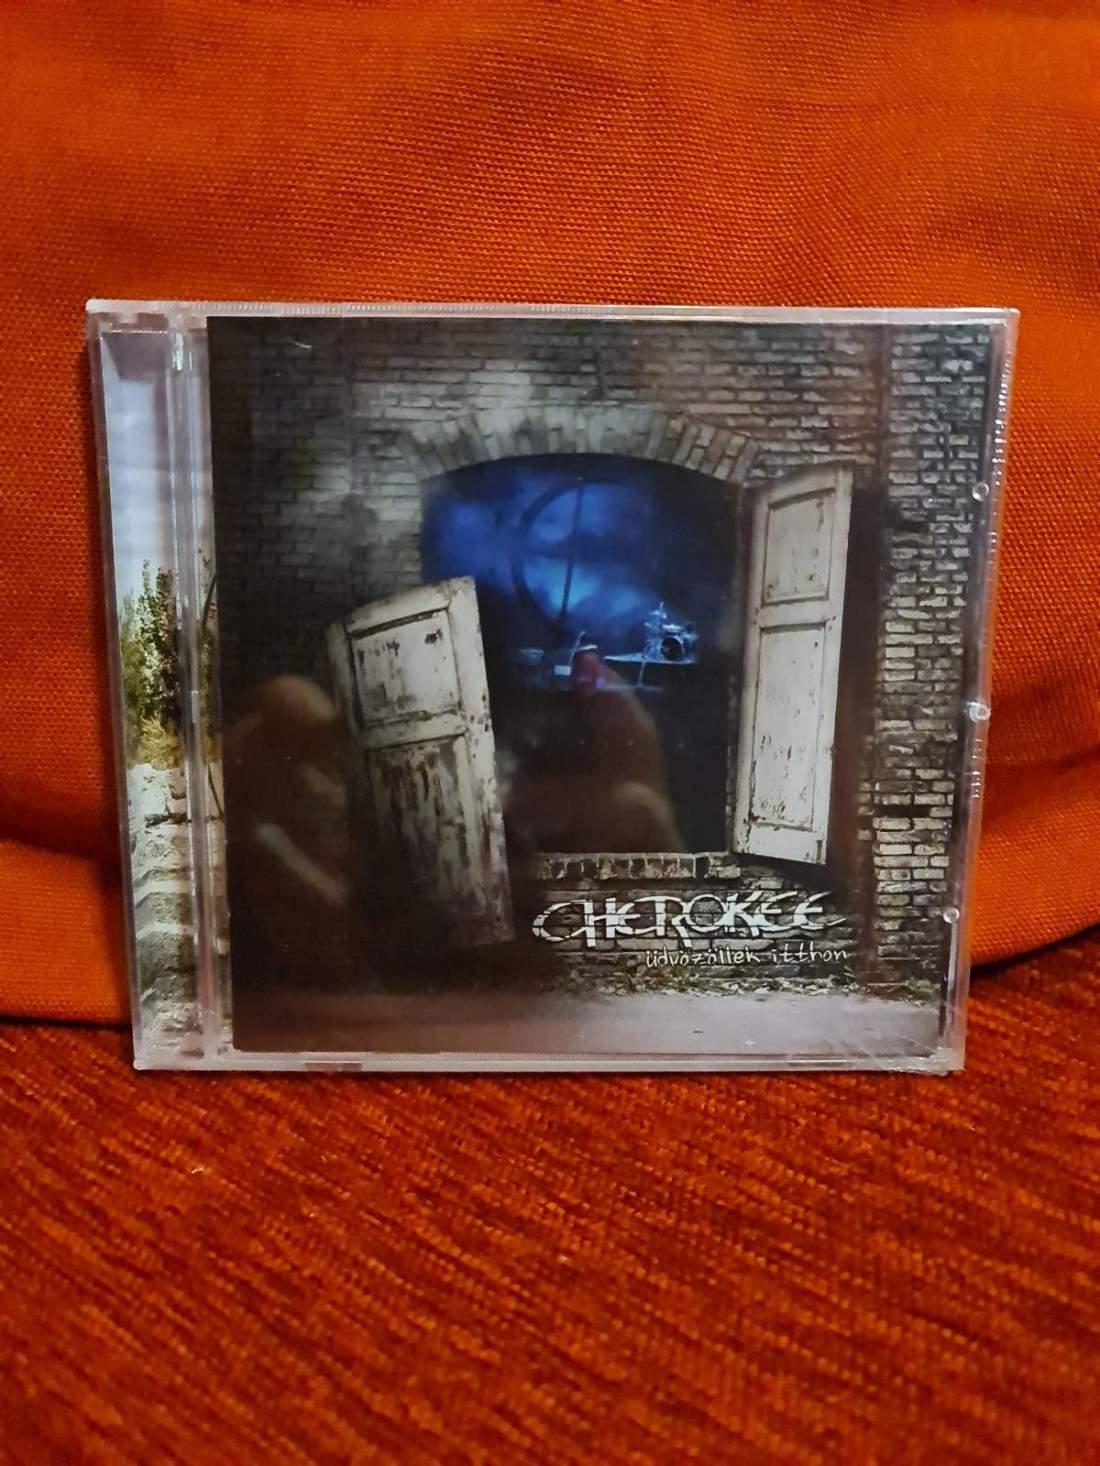 CHEROKEE - ÜDVÖZÖLLEK ITTHON CD